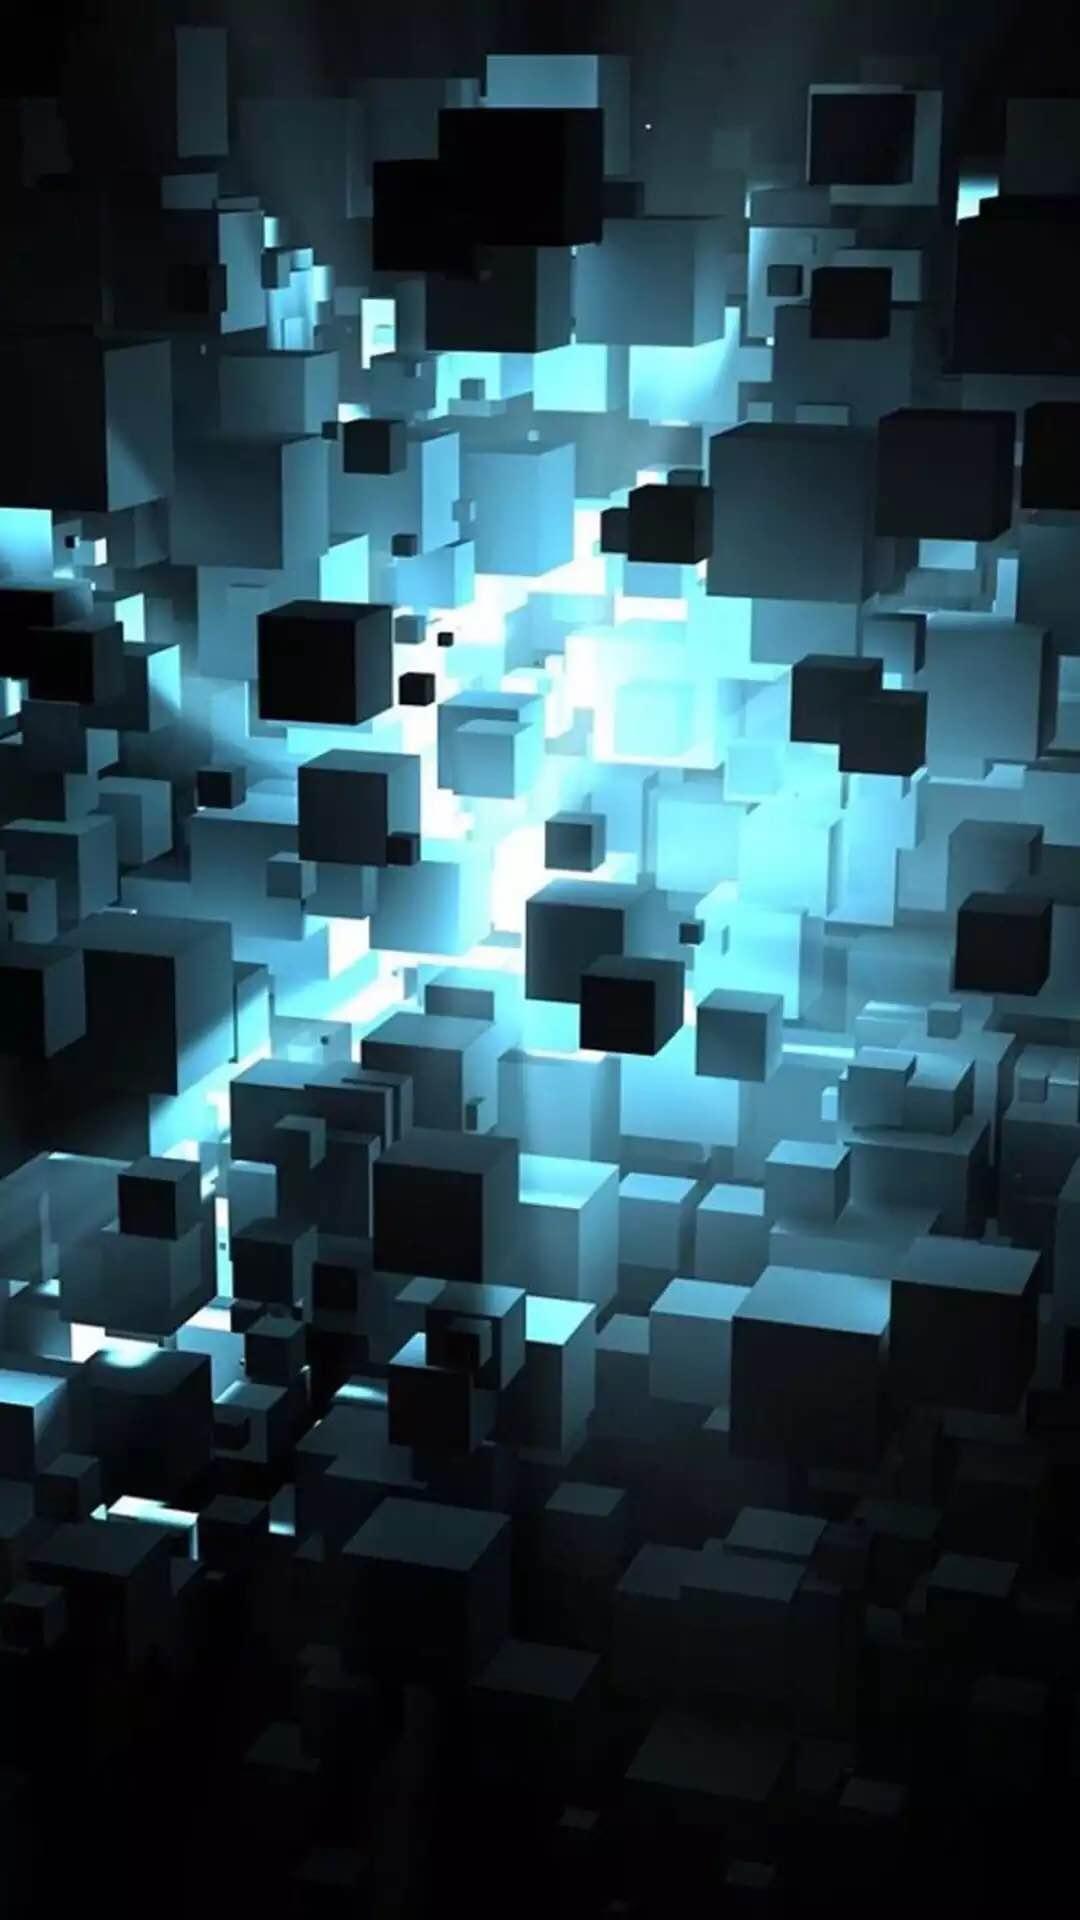 Abstract Blocks Android Wallpaper